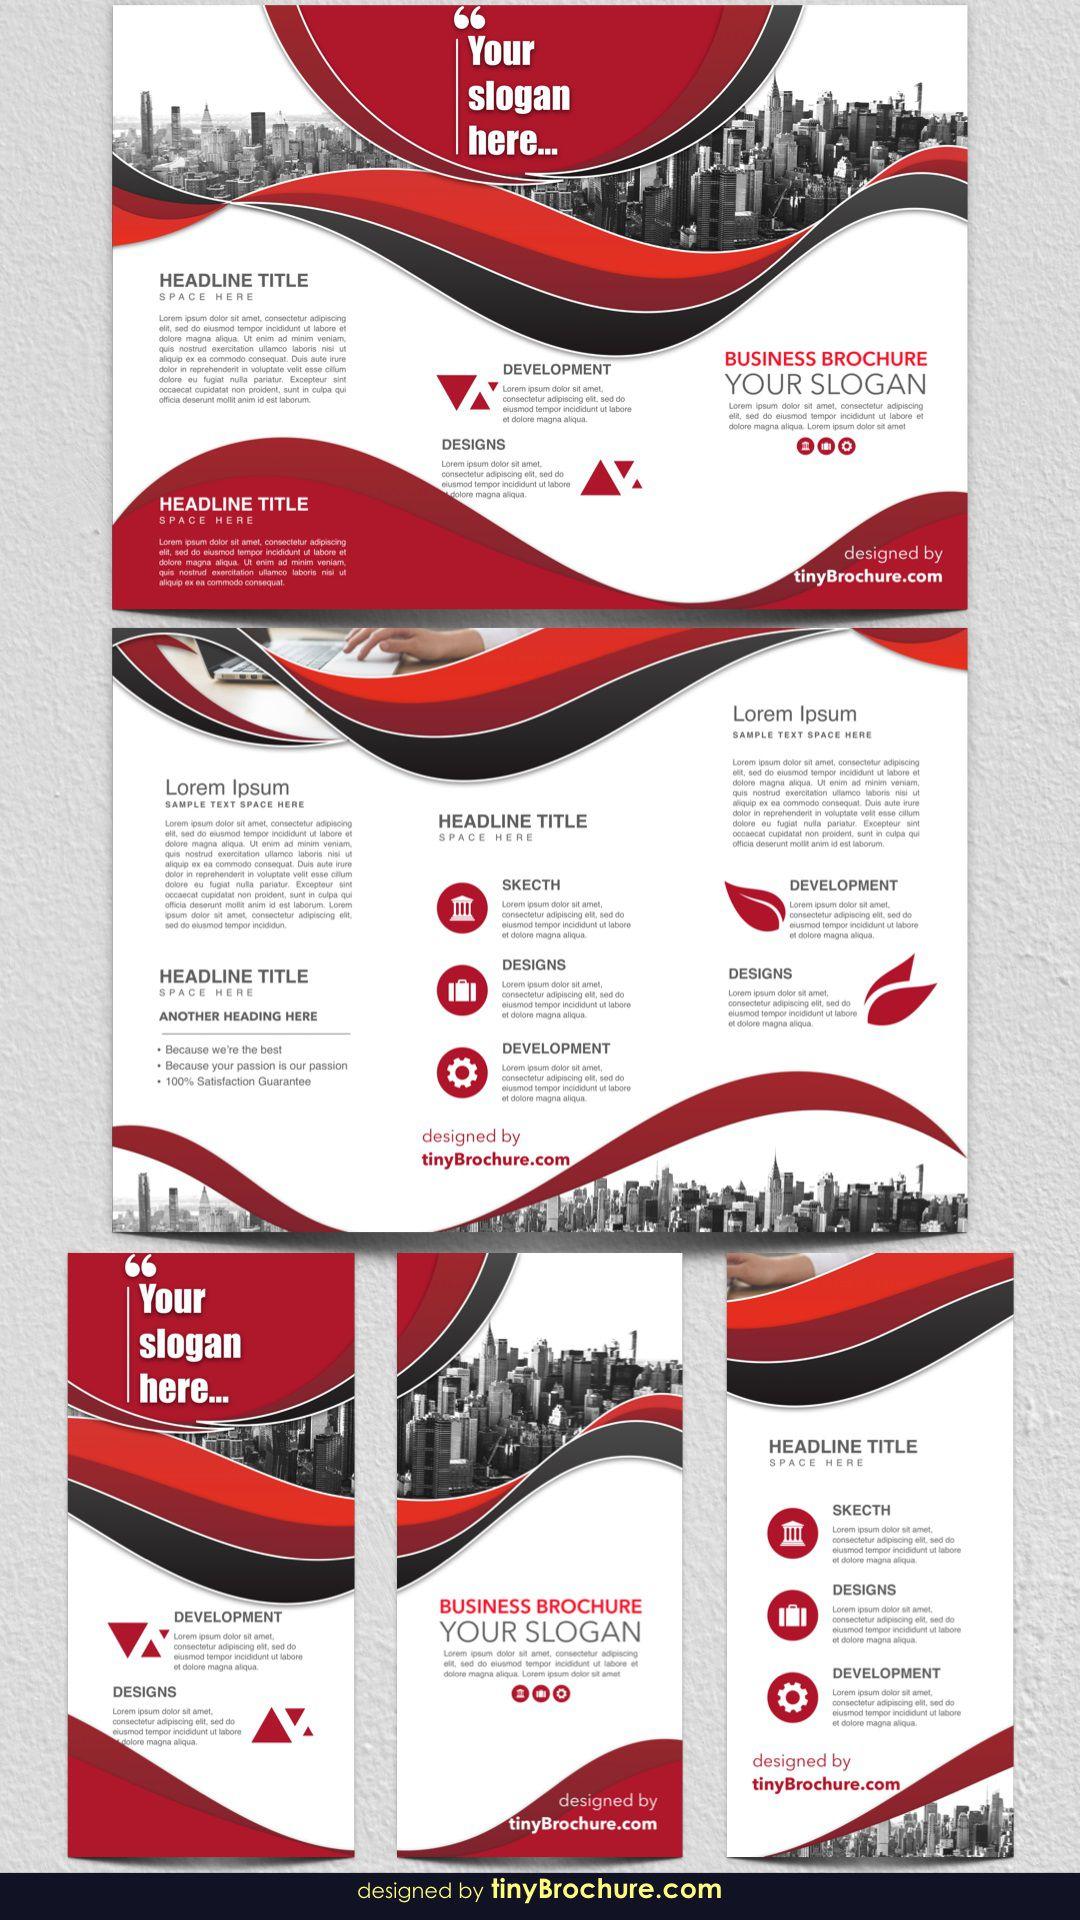 001 Stupendou Tri Fold Template Google Doc Image  Docs Brochure Free Pamphlet Blank SlideFull